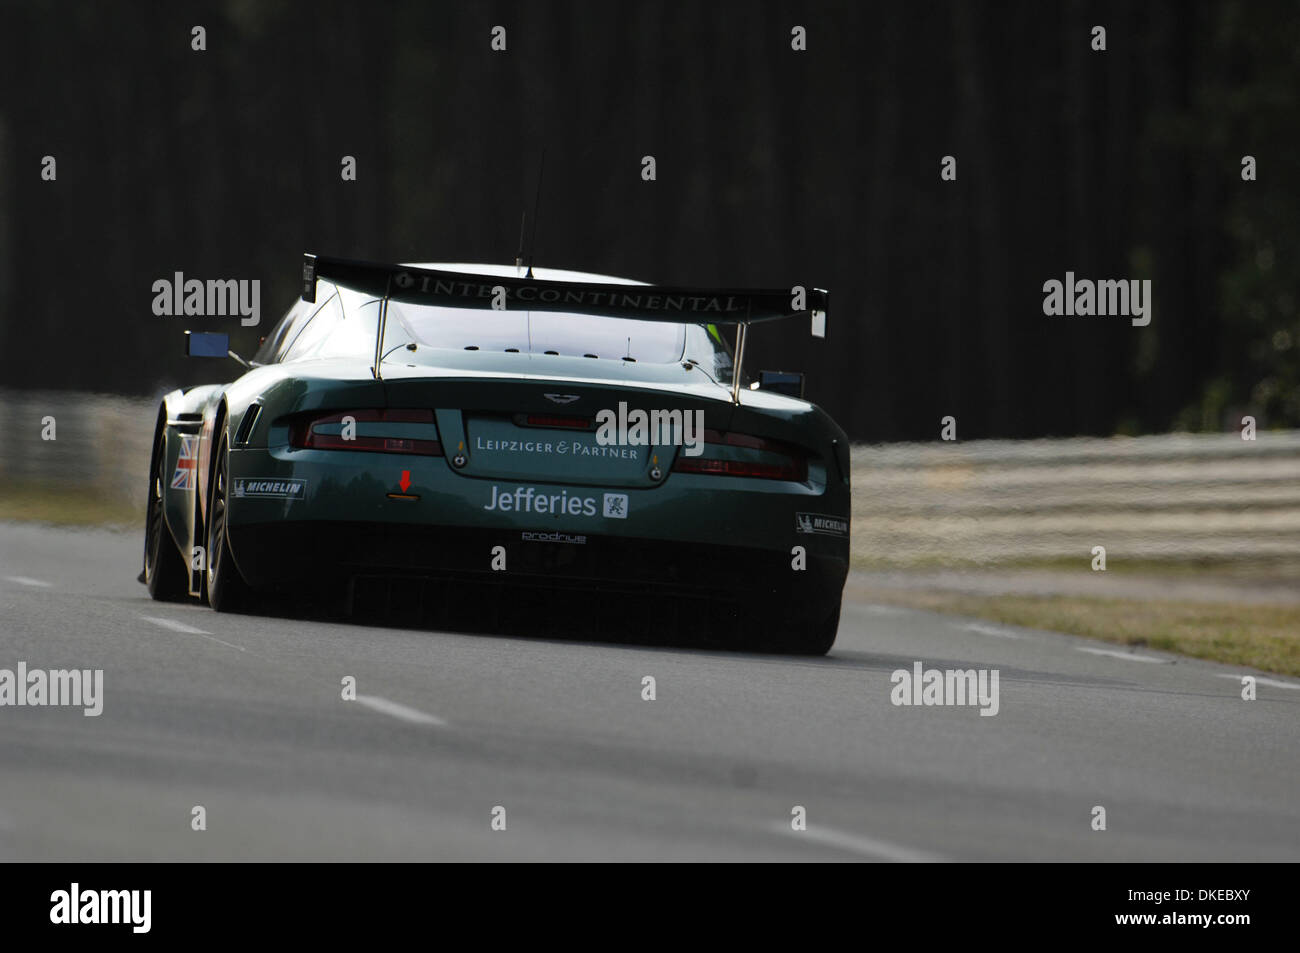 https www alamy com jun 17 2007 le mans france 009 aston martin racing aston martin dbr9 image63626275 html